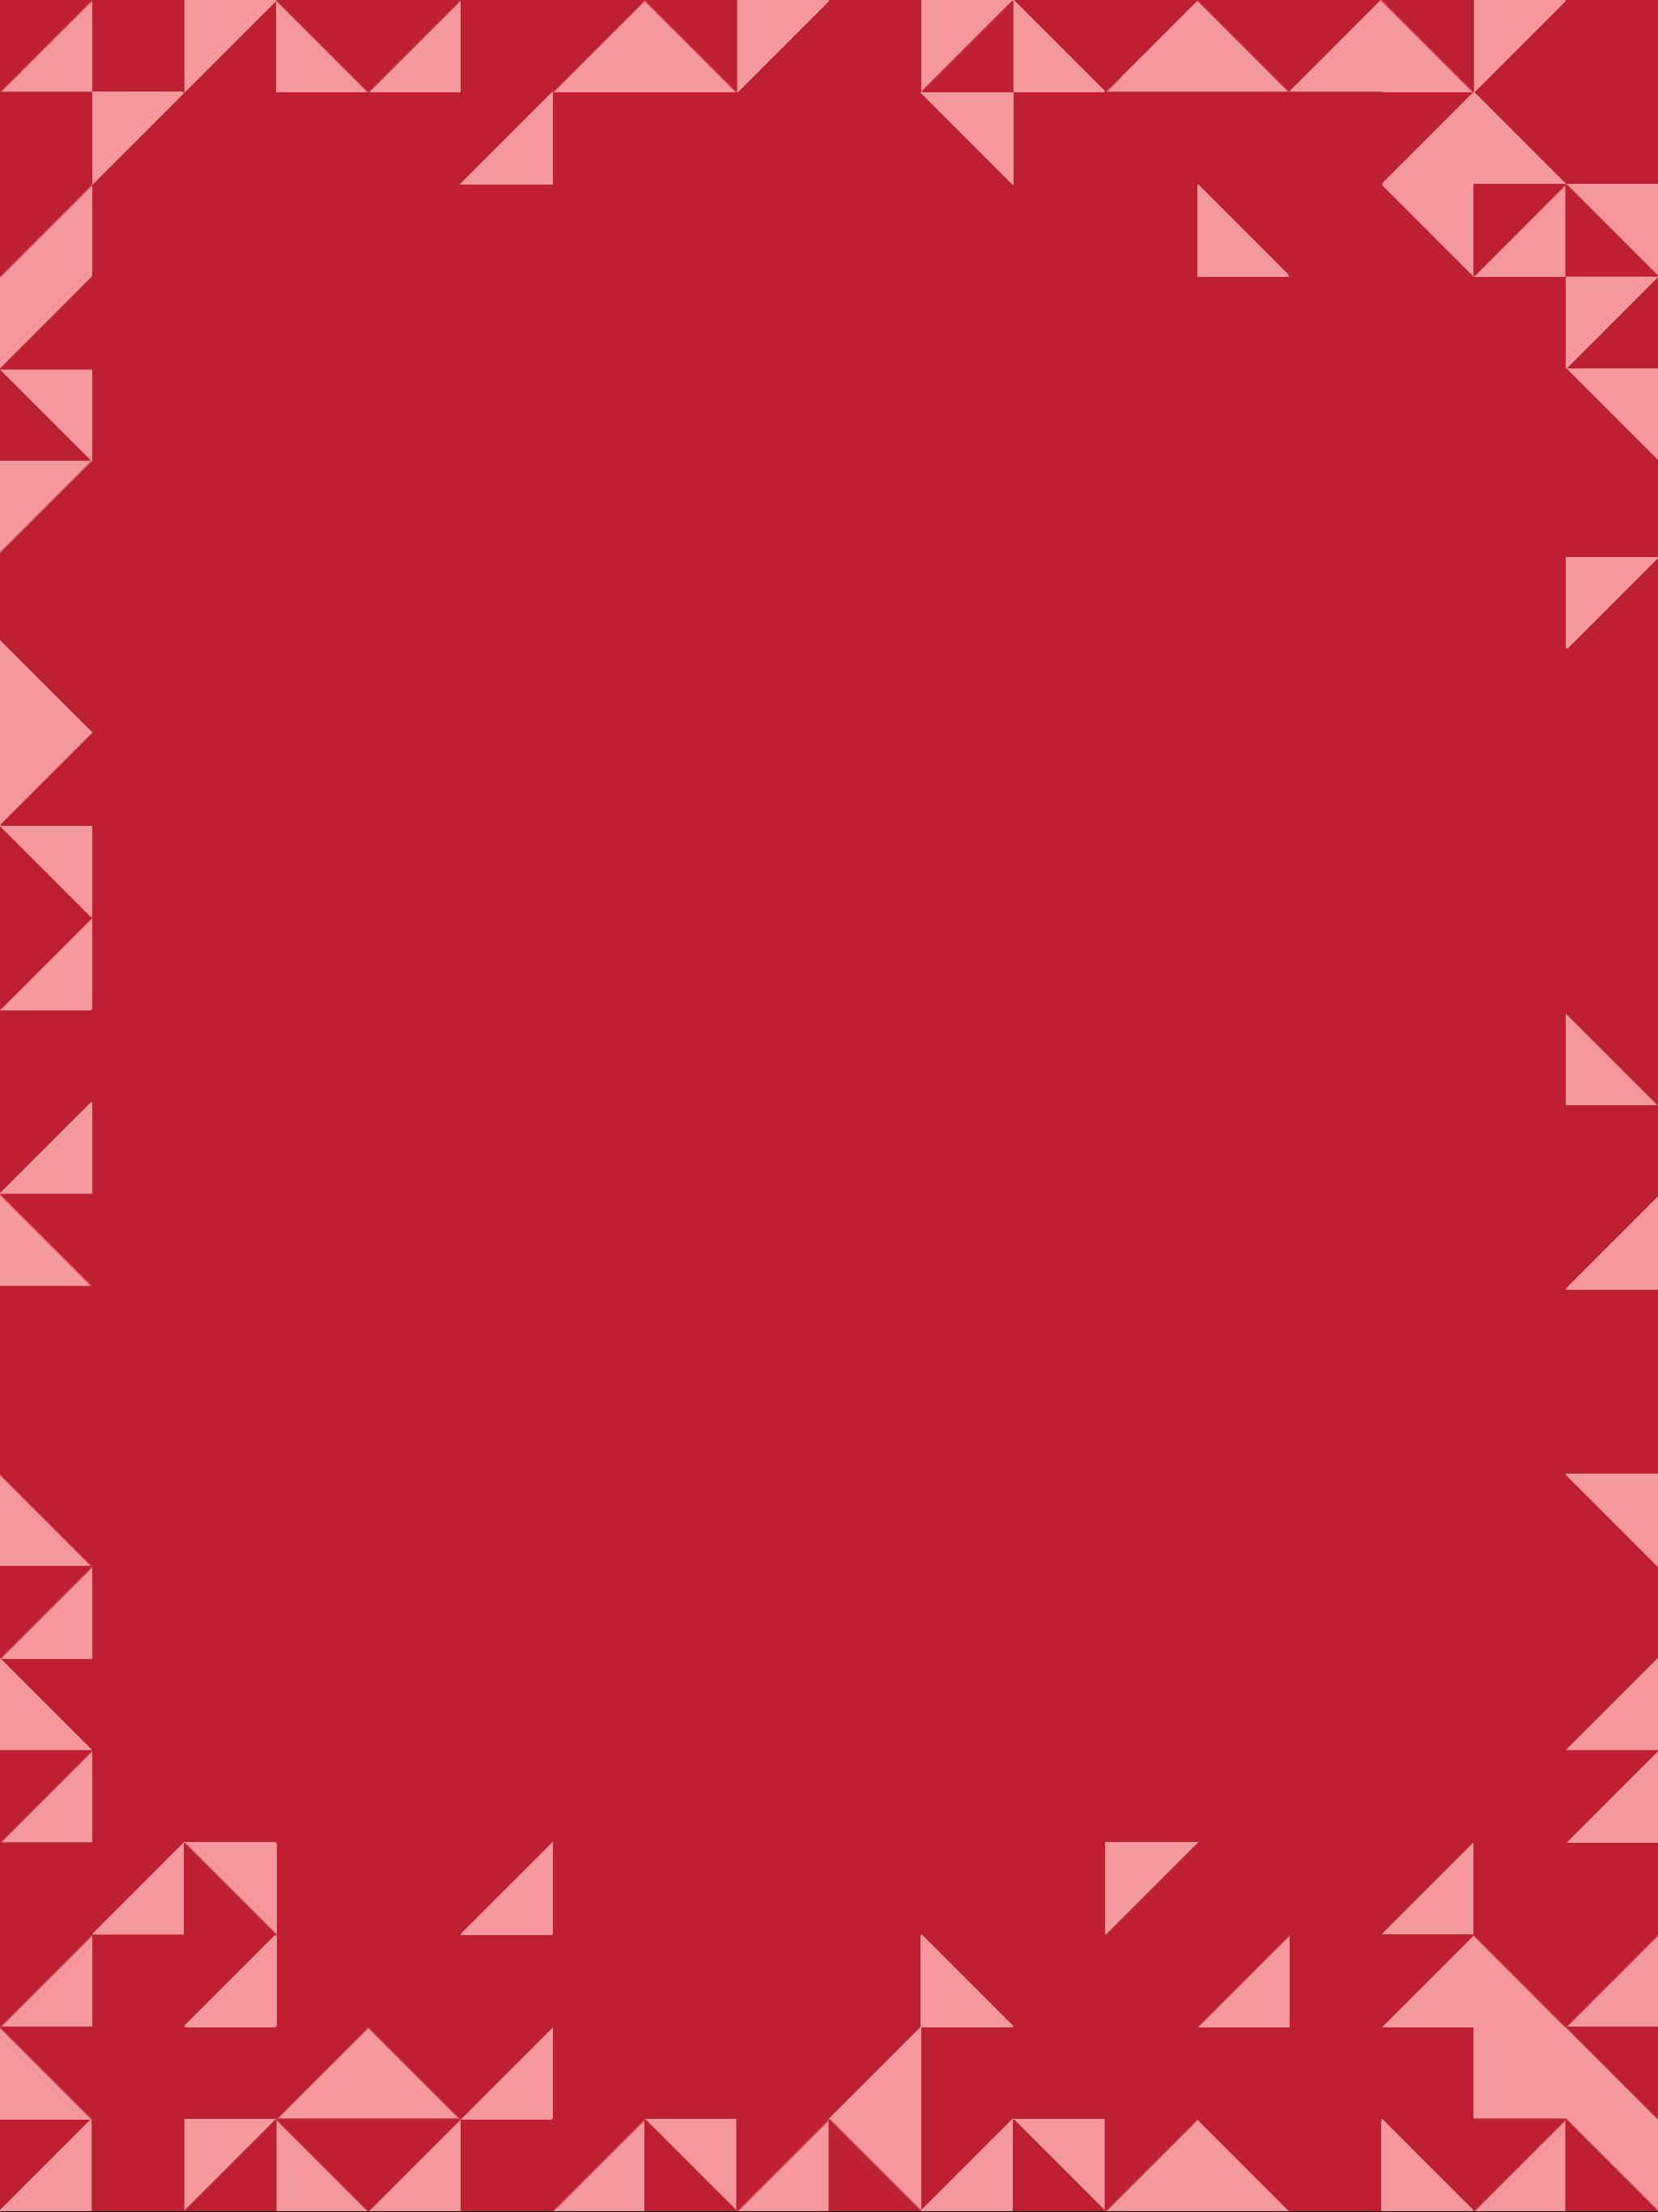 Ipad Vertical_2048x2732_Geo_Red.png